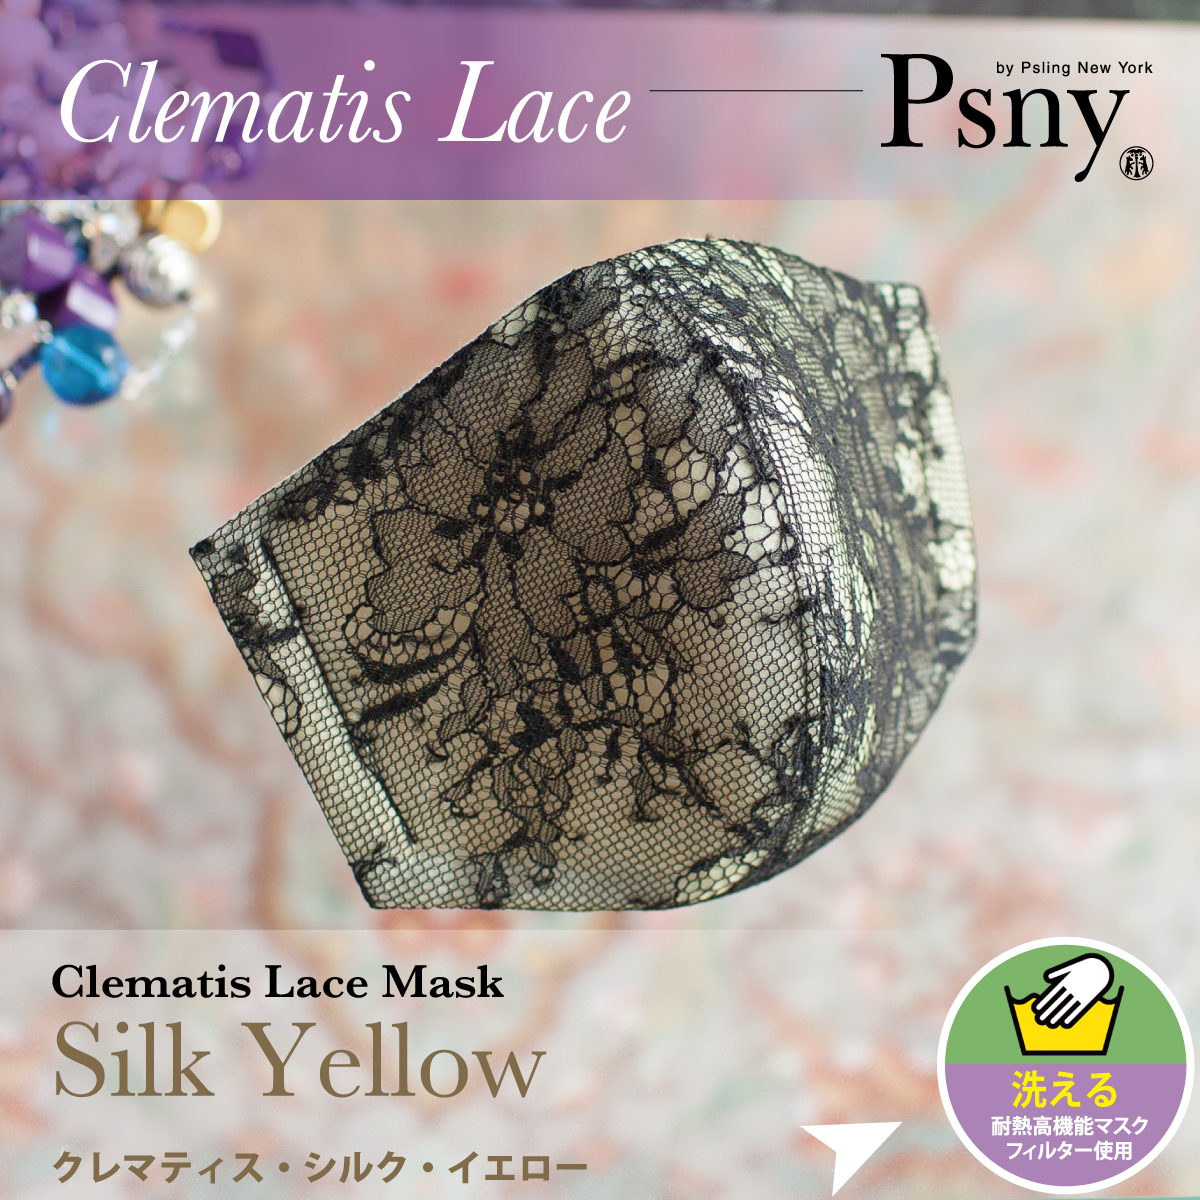 PSNY クレマティス レース イエロー シルク  花粉 黄砂 洗える不織布フィルター入り 立体 大人用 マスク 送料無料 L06